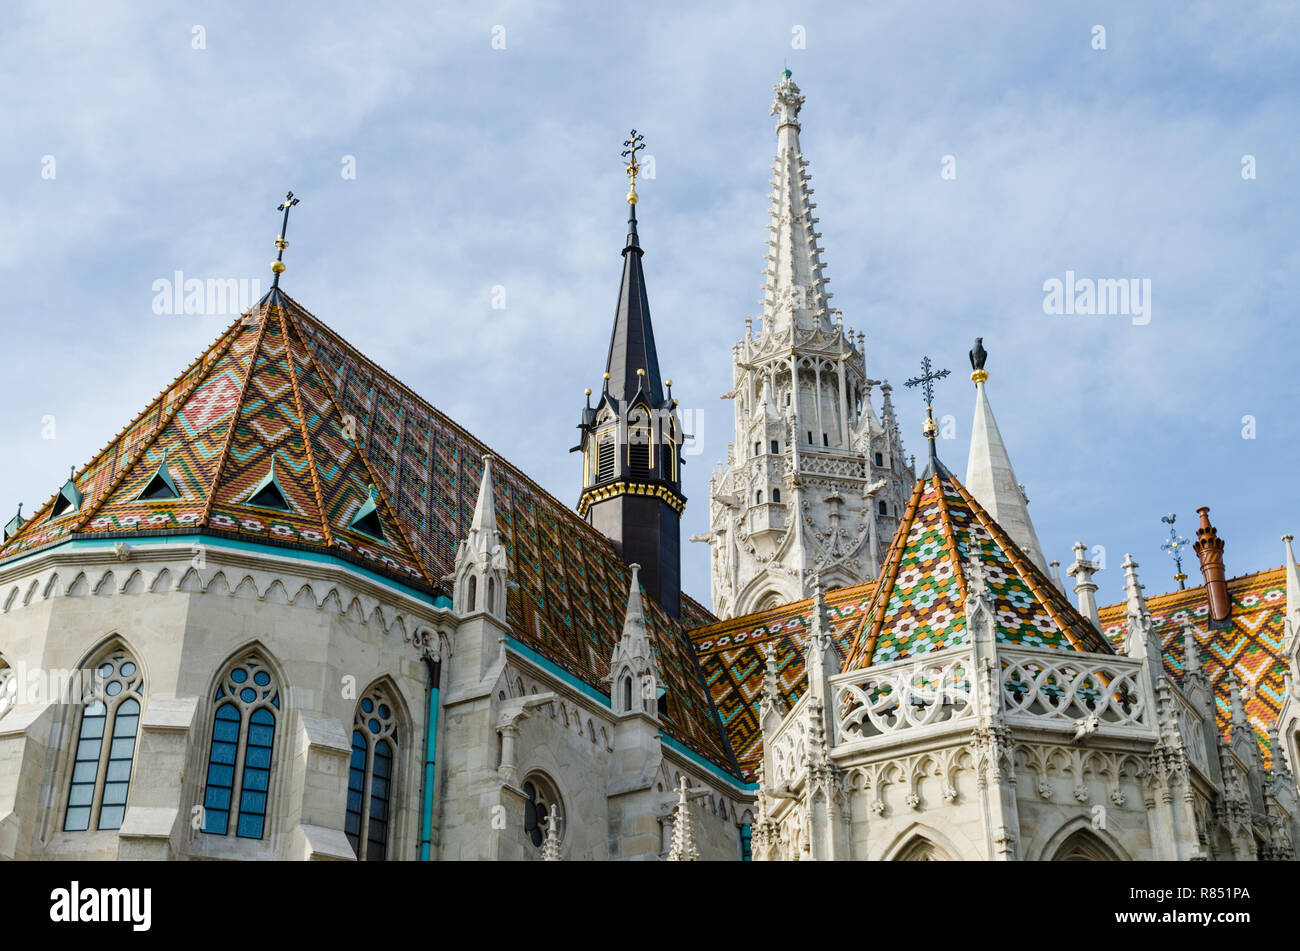 Matthias church spires, Castle hill, Budapest, Hungary - Stock Image